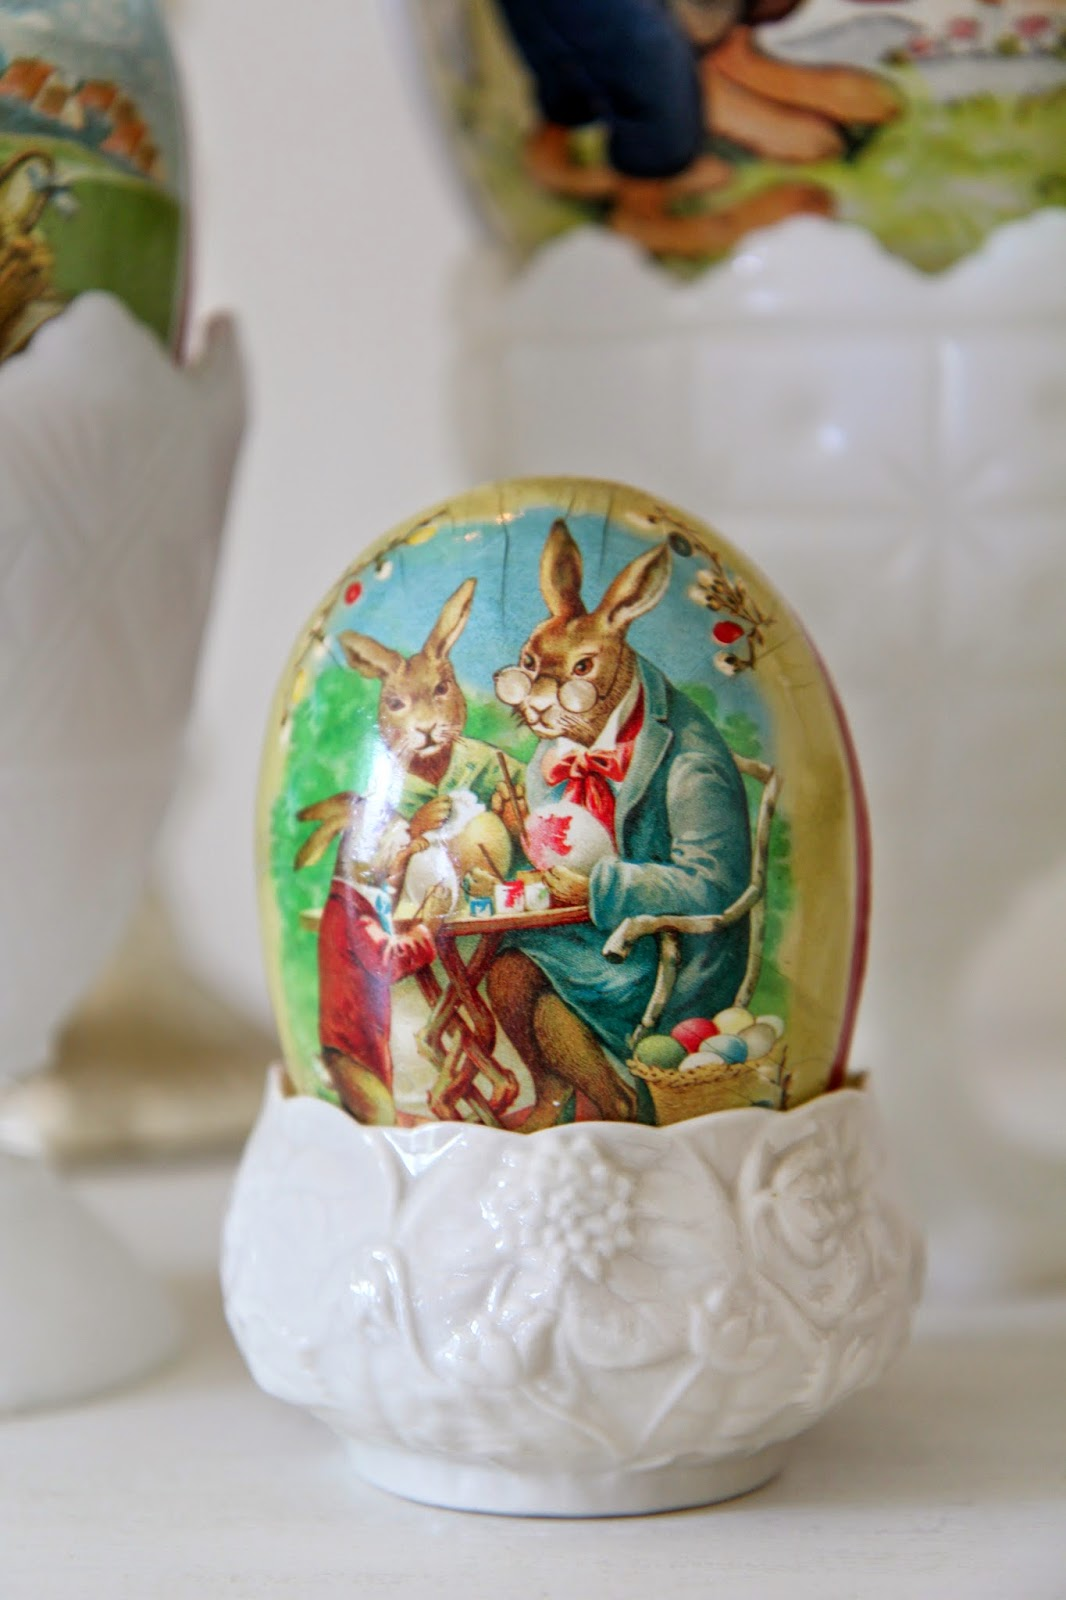 Bunny cardboard eggs; Easter Buffet Table Decor - Nora's Nest